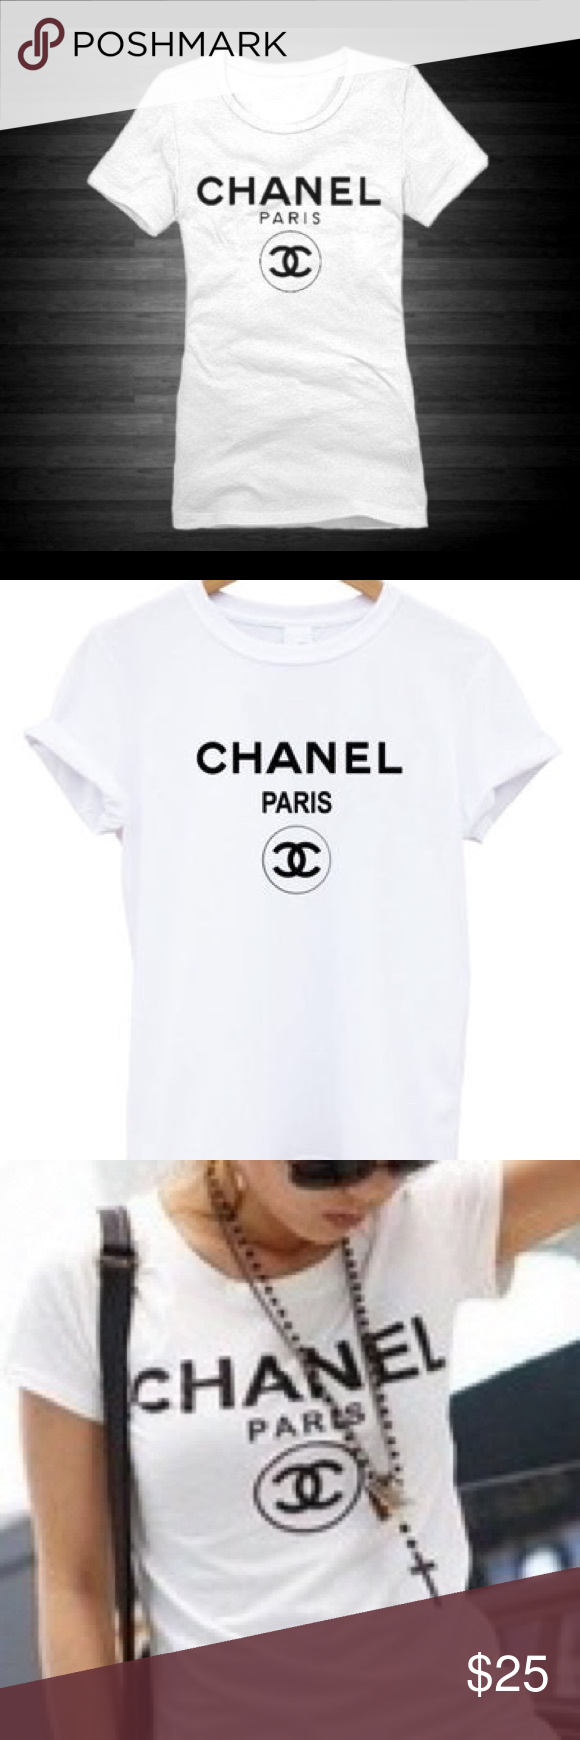 CHANEL logo Tee Shirt Classic CHANEL (inspired) tee shirt